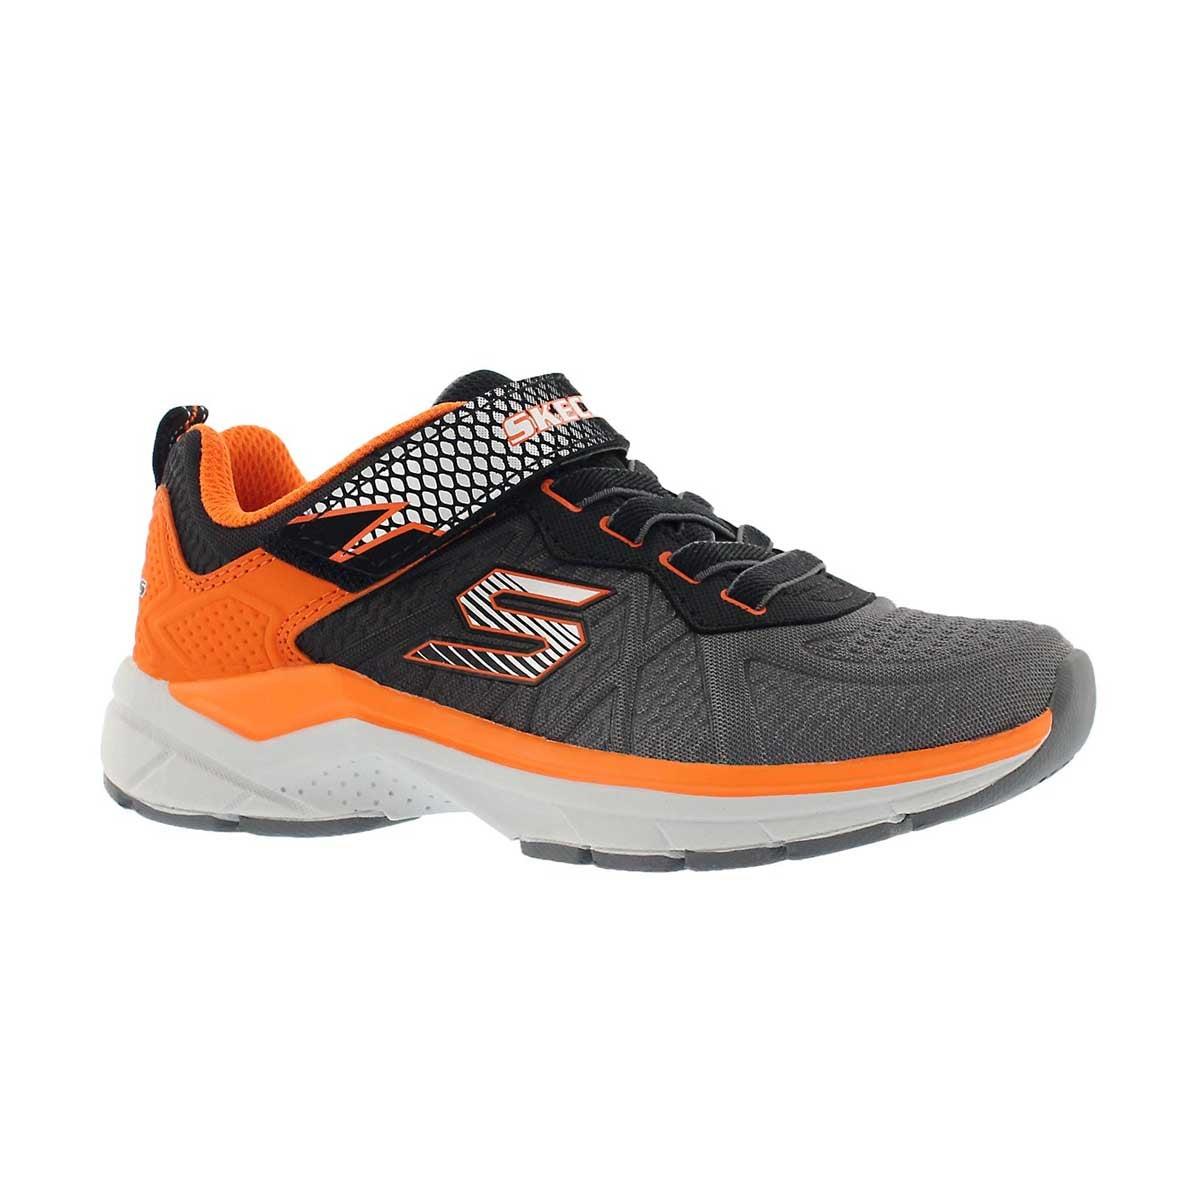 Boys' ULTRASONIX charcoal/orange sneakers